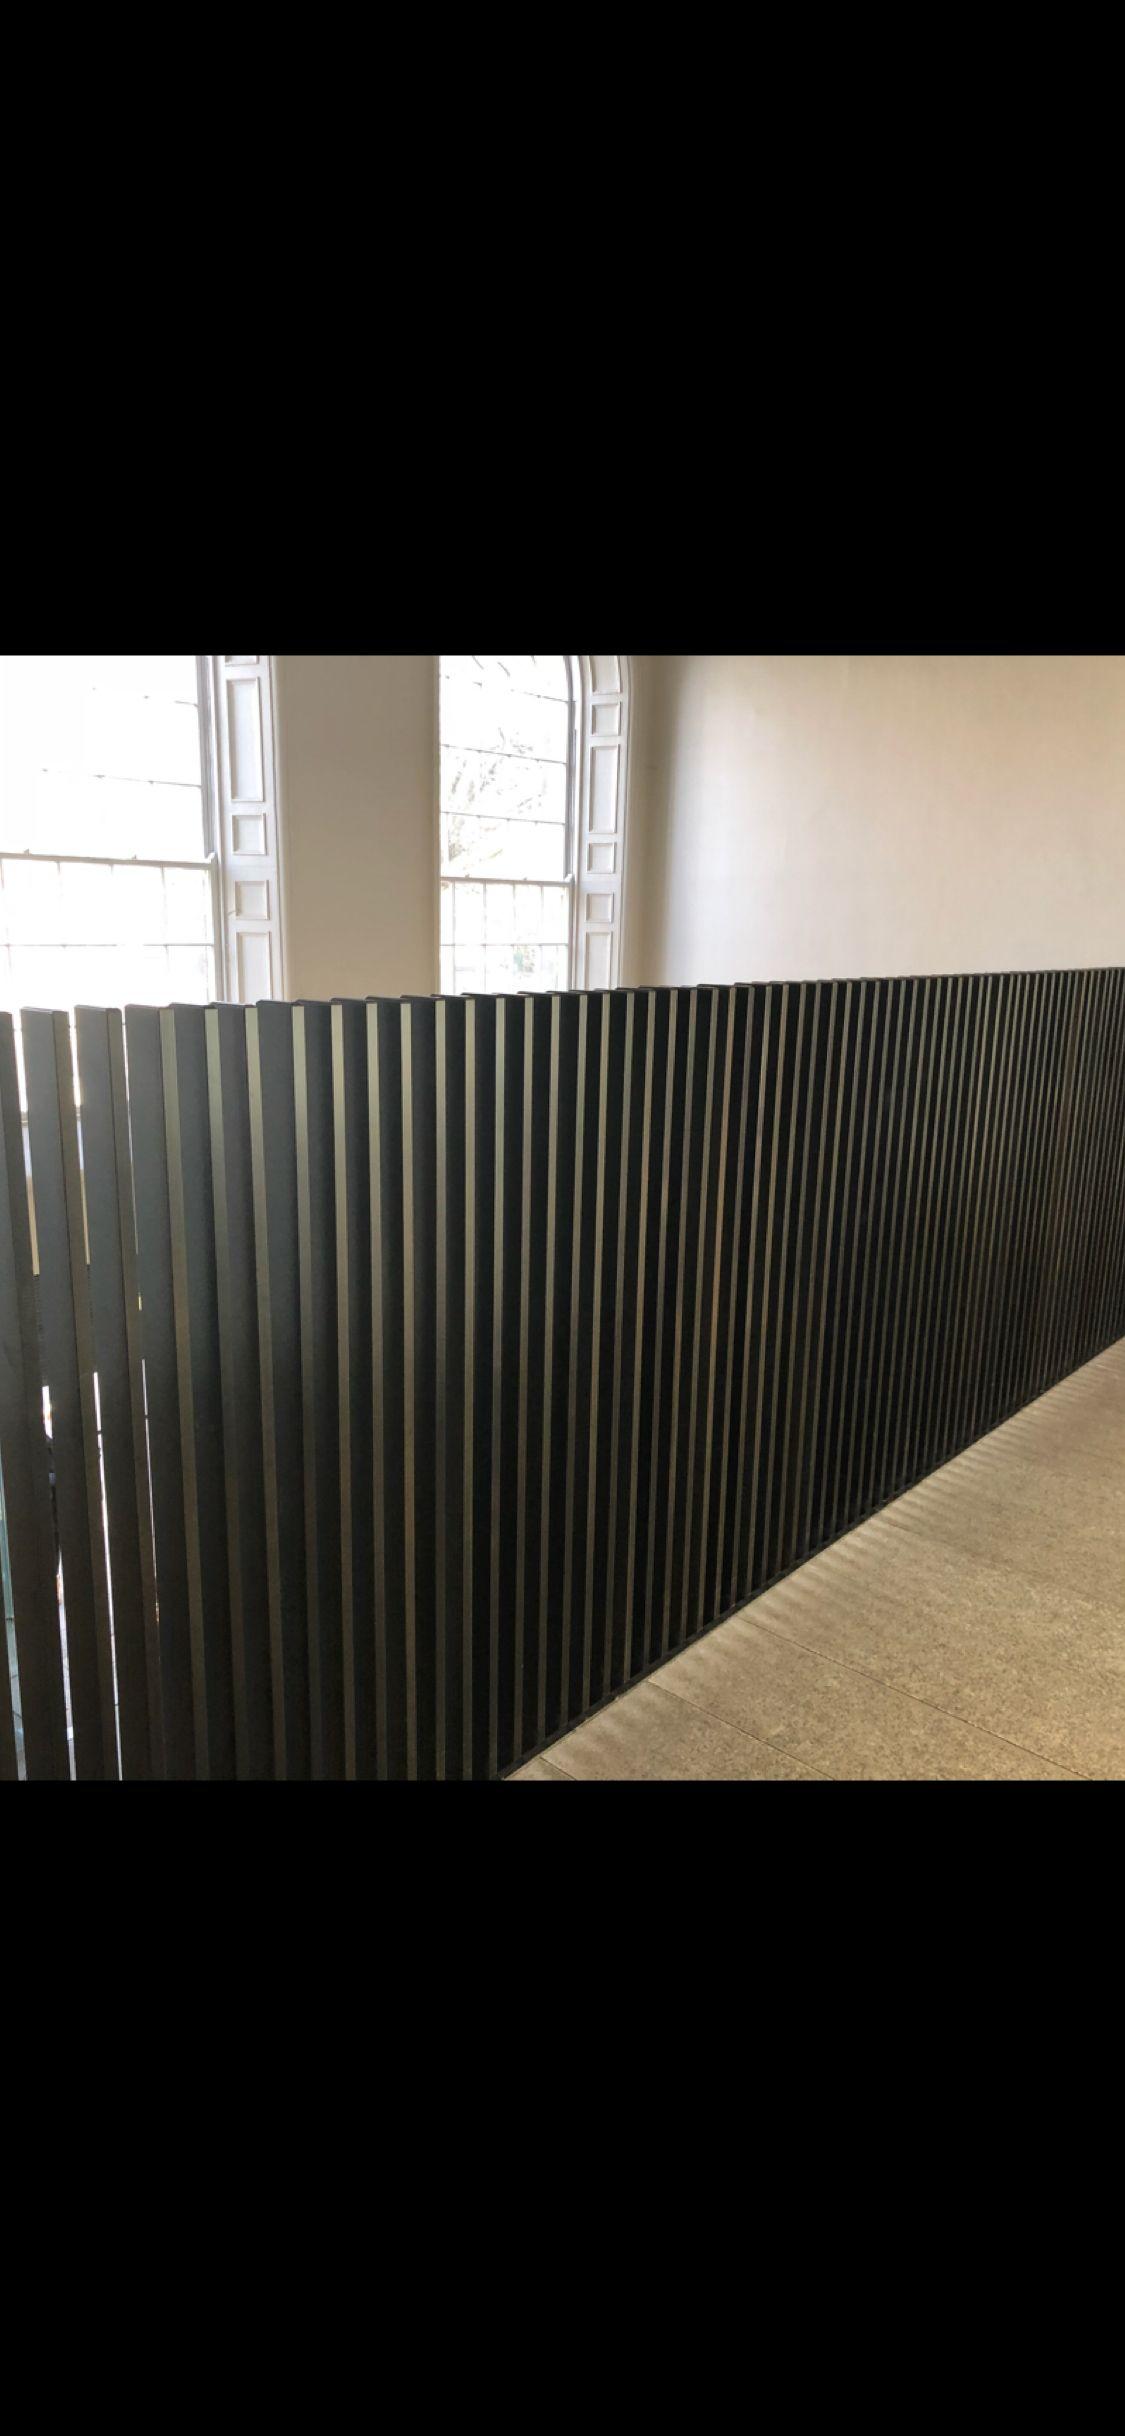 Conservatory Room Addition In The Uk 1040x1485 In 2020: @Coffeeshop @Kilmainham Gaol Museum #Dublin